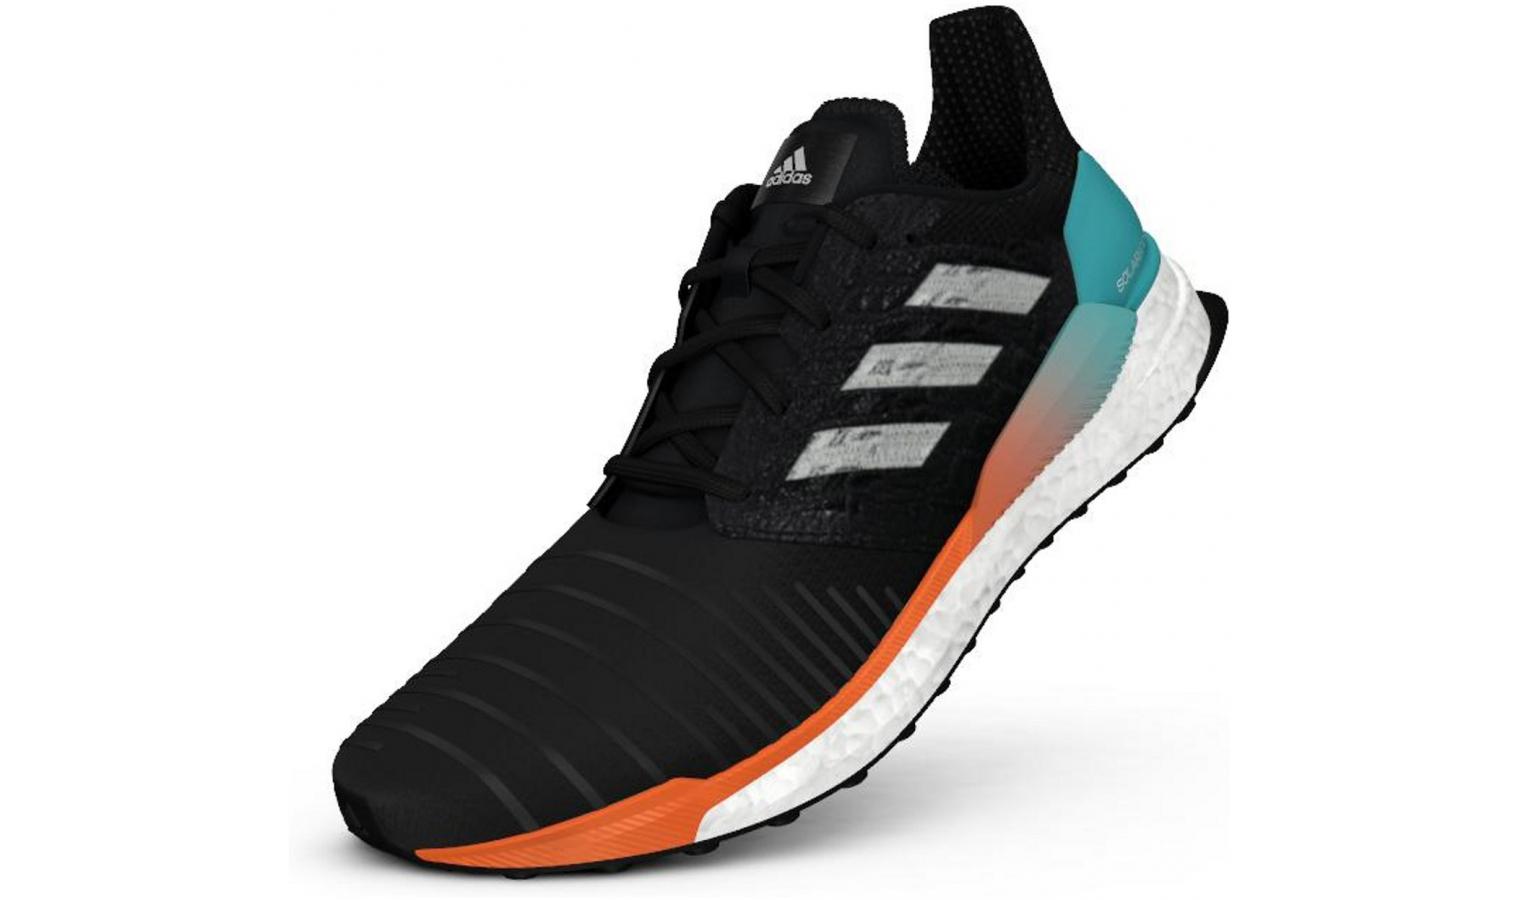 Pánske bežecké topánky adidas SOLAR BOOST čierne  e7ed43bd6fa